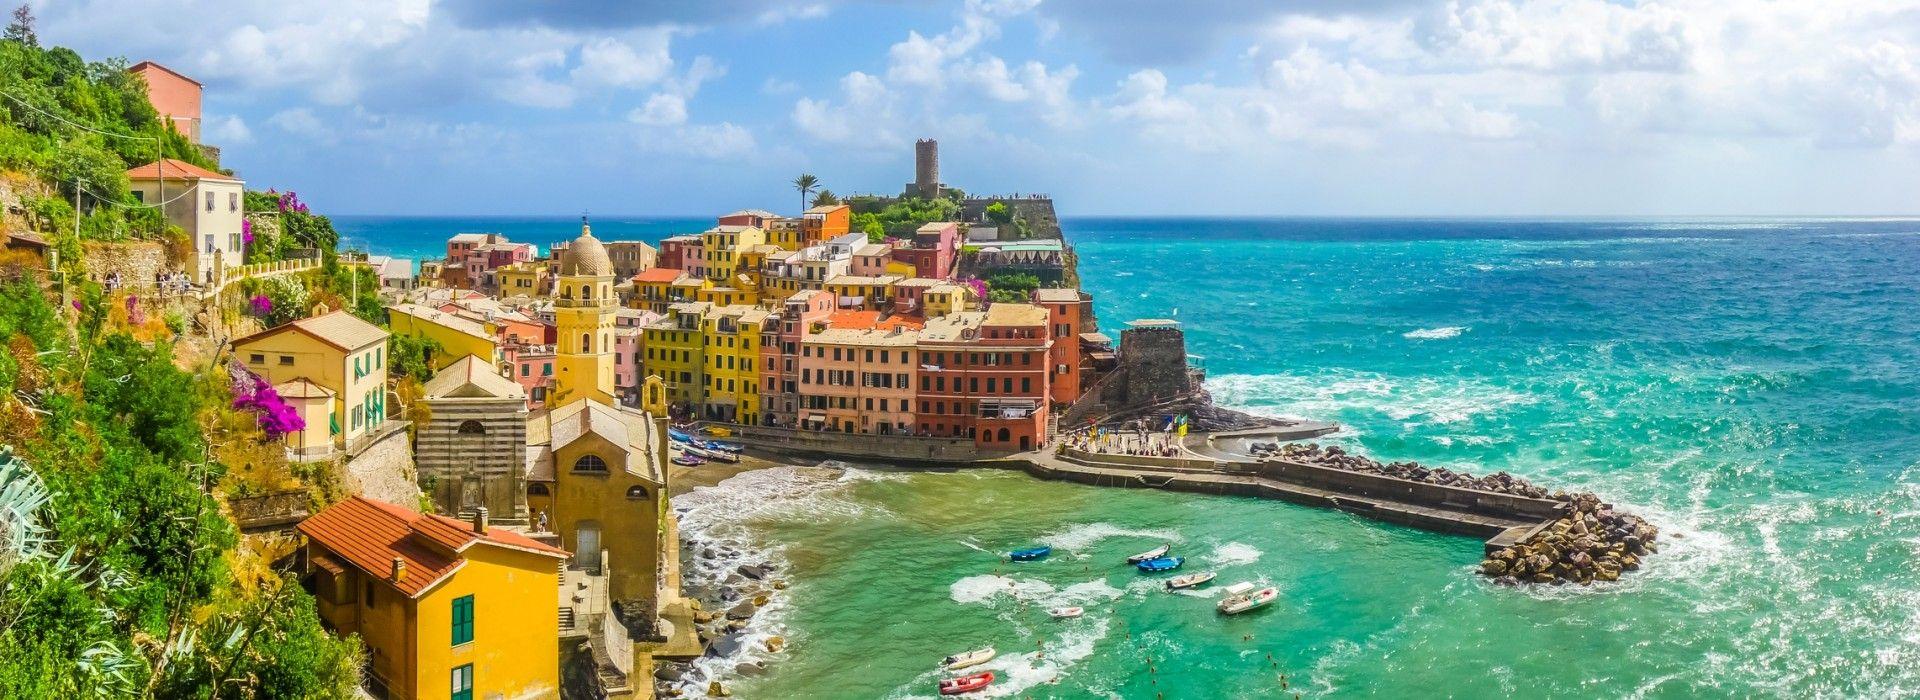 Venice & Veneto Tours